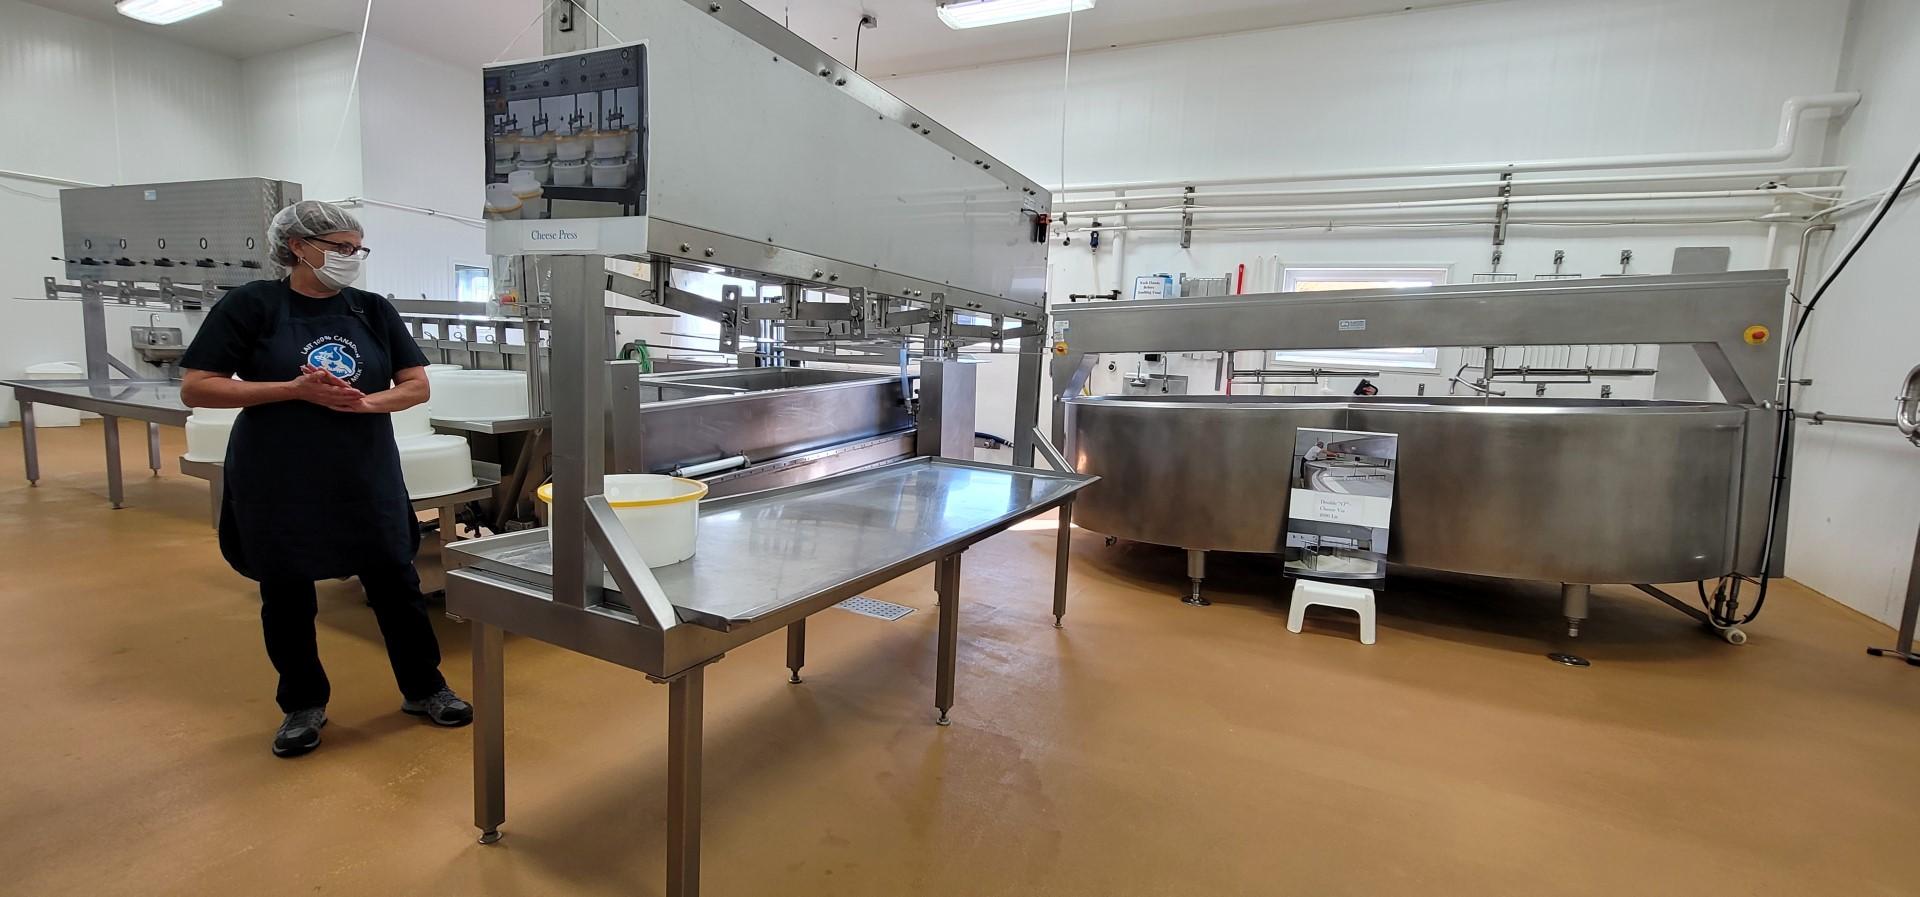 cheese making machines in Ontario